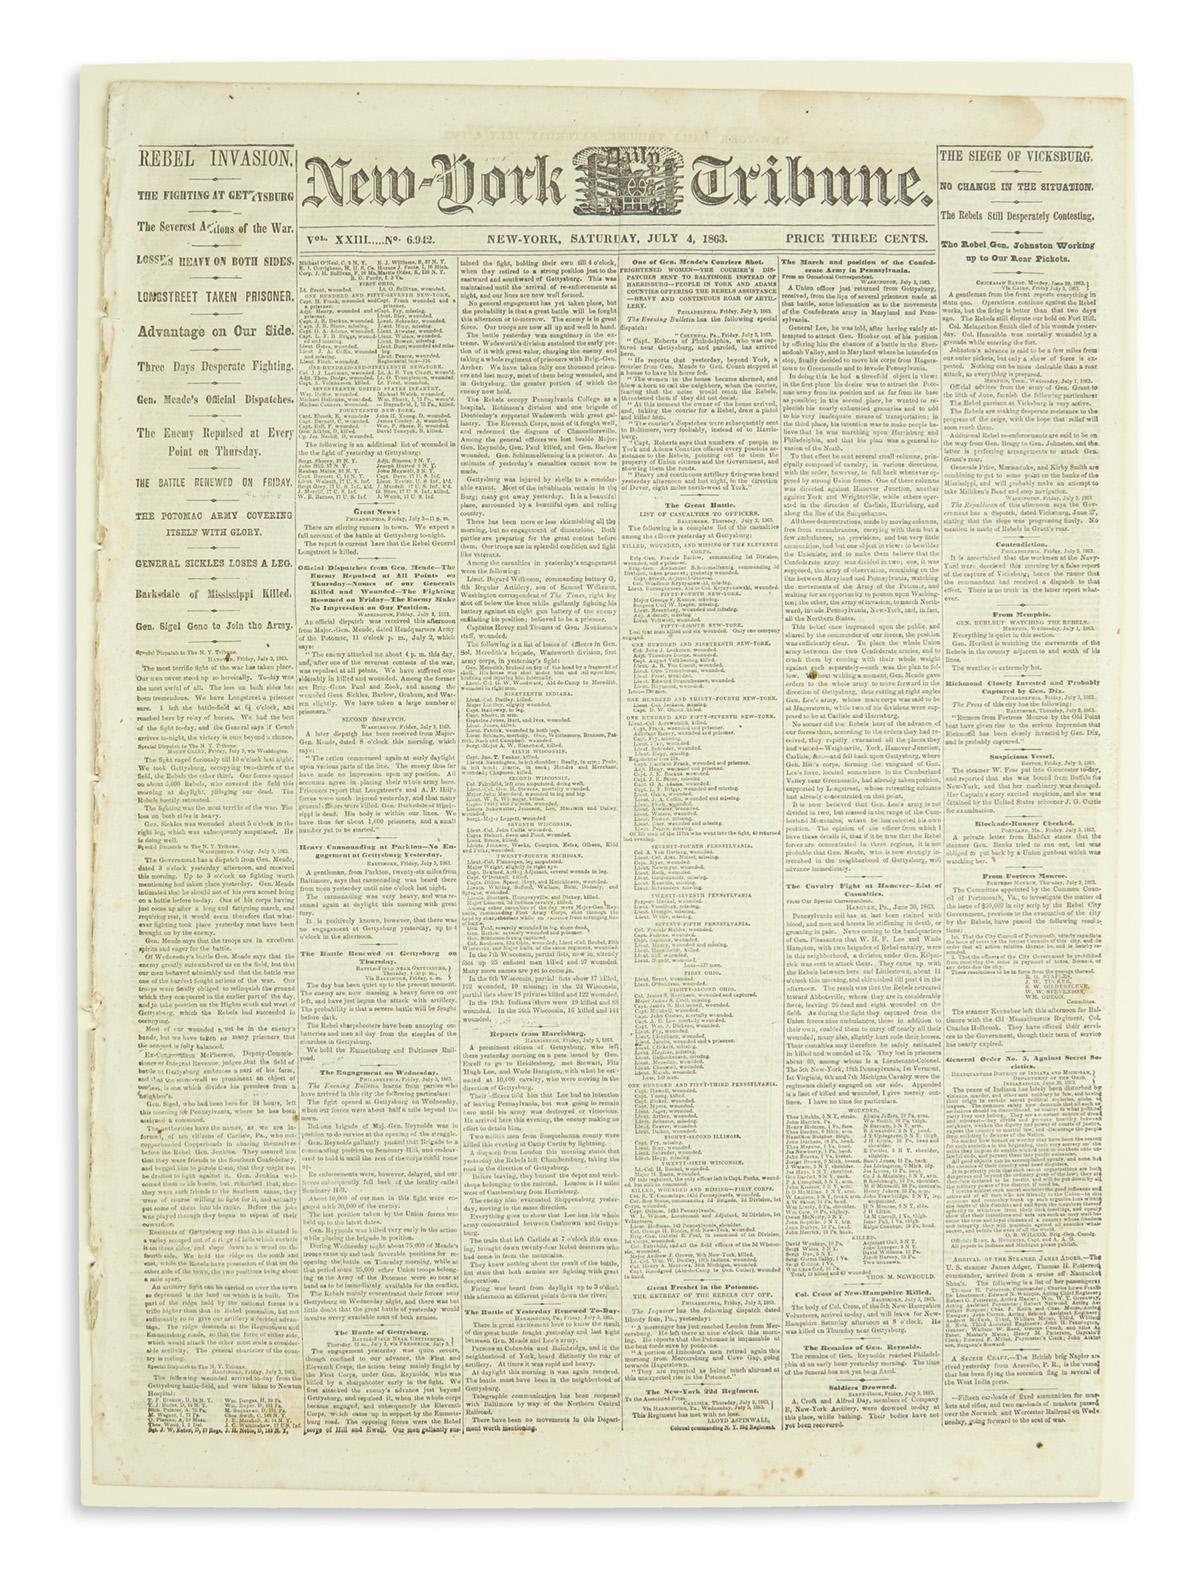 (CIVIL WAR.) New-York Tribune account of the Battle of Gettysburg.